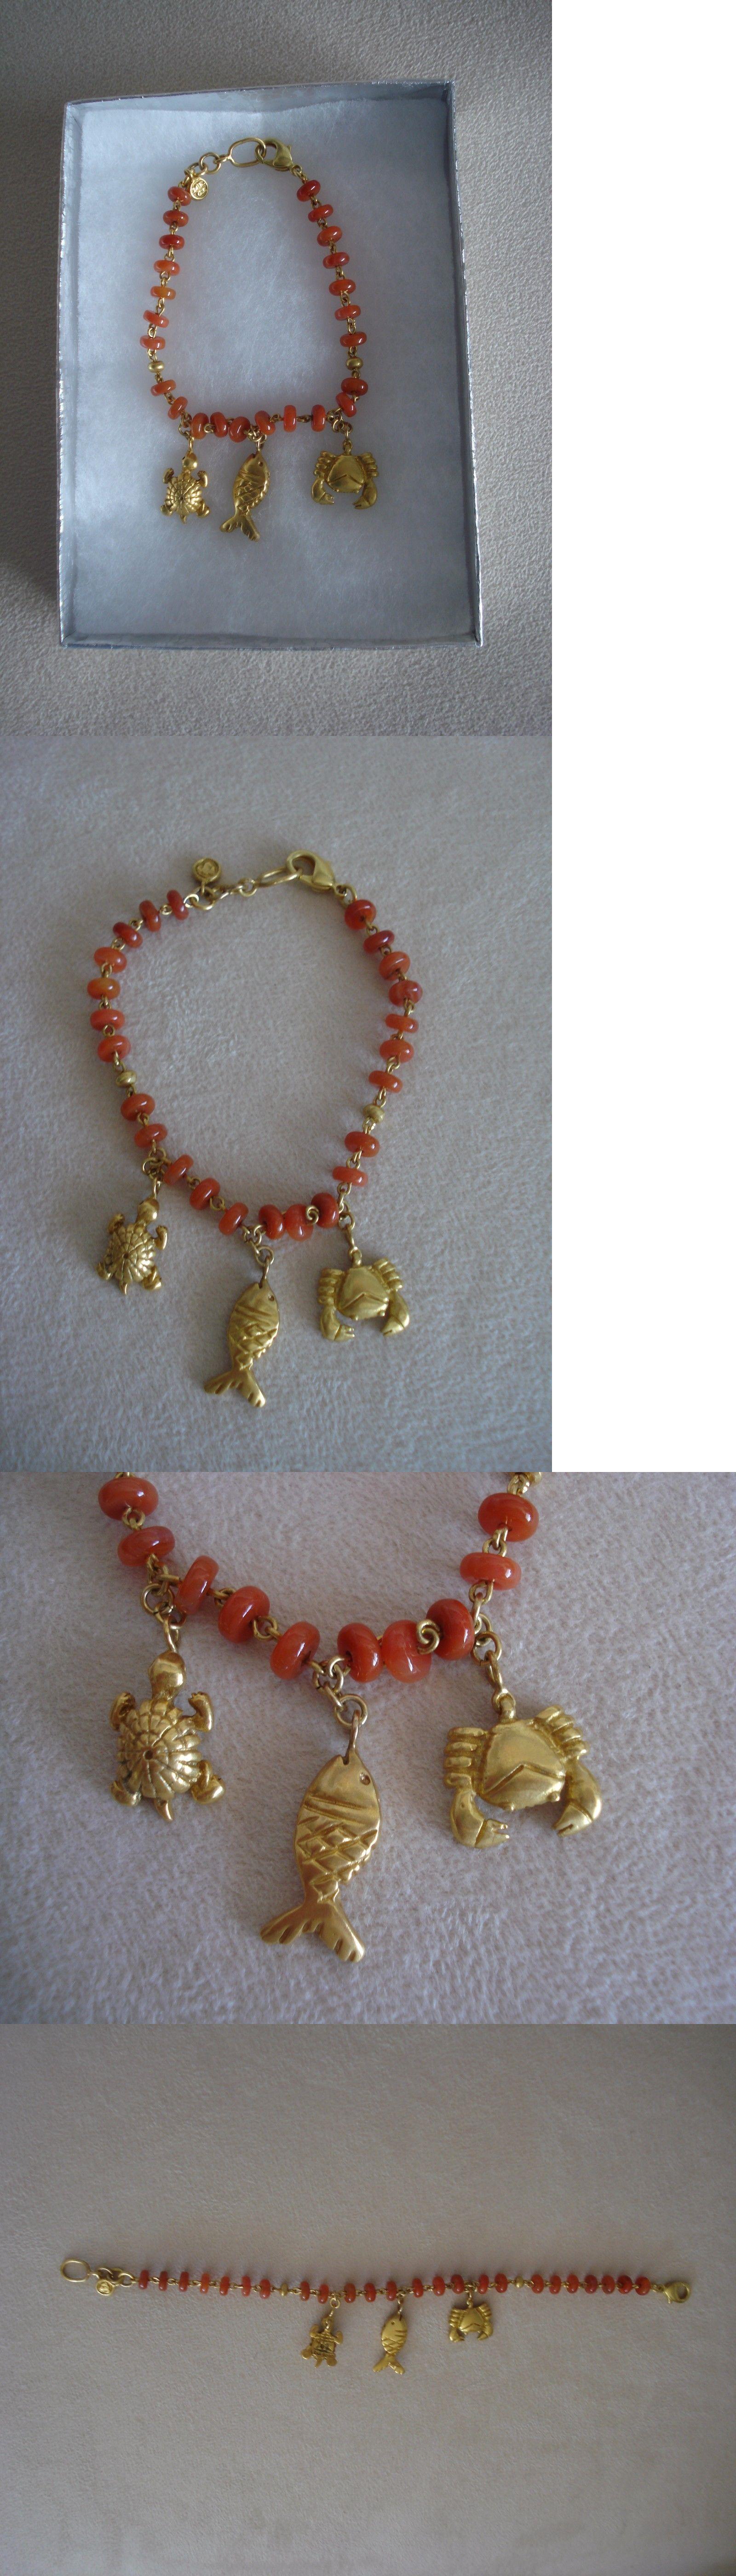 Bracelets 98504 Precolumbian Replica Bracelet Semiprecious Stones